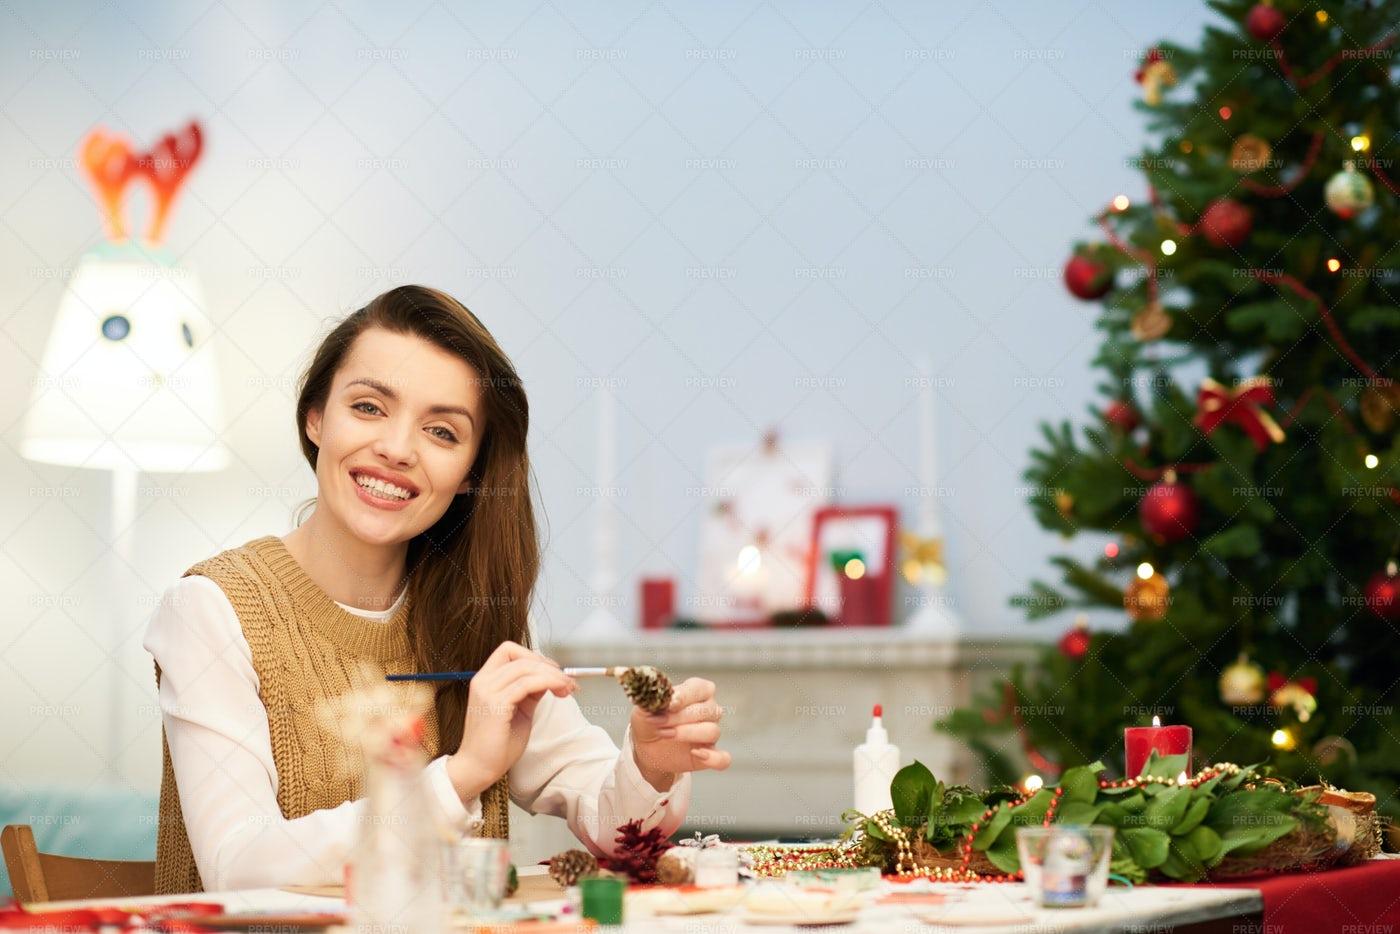 Attractive Woman Making Christmas...: Stock Photos